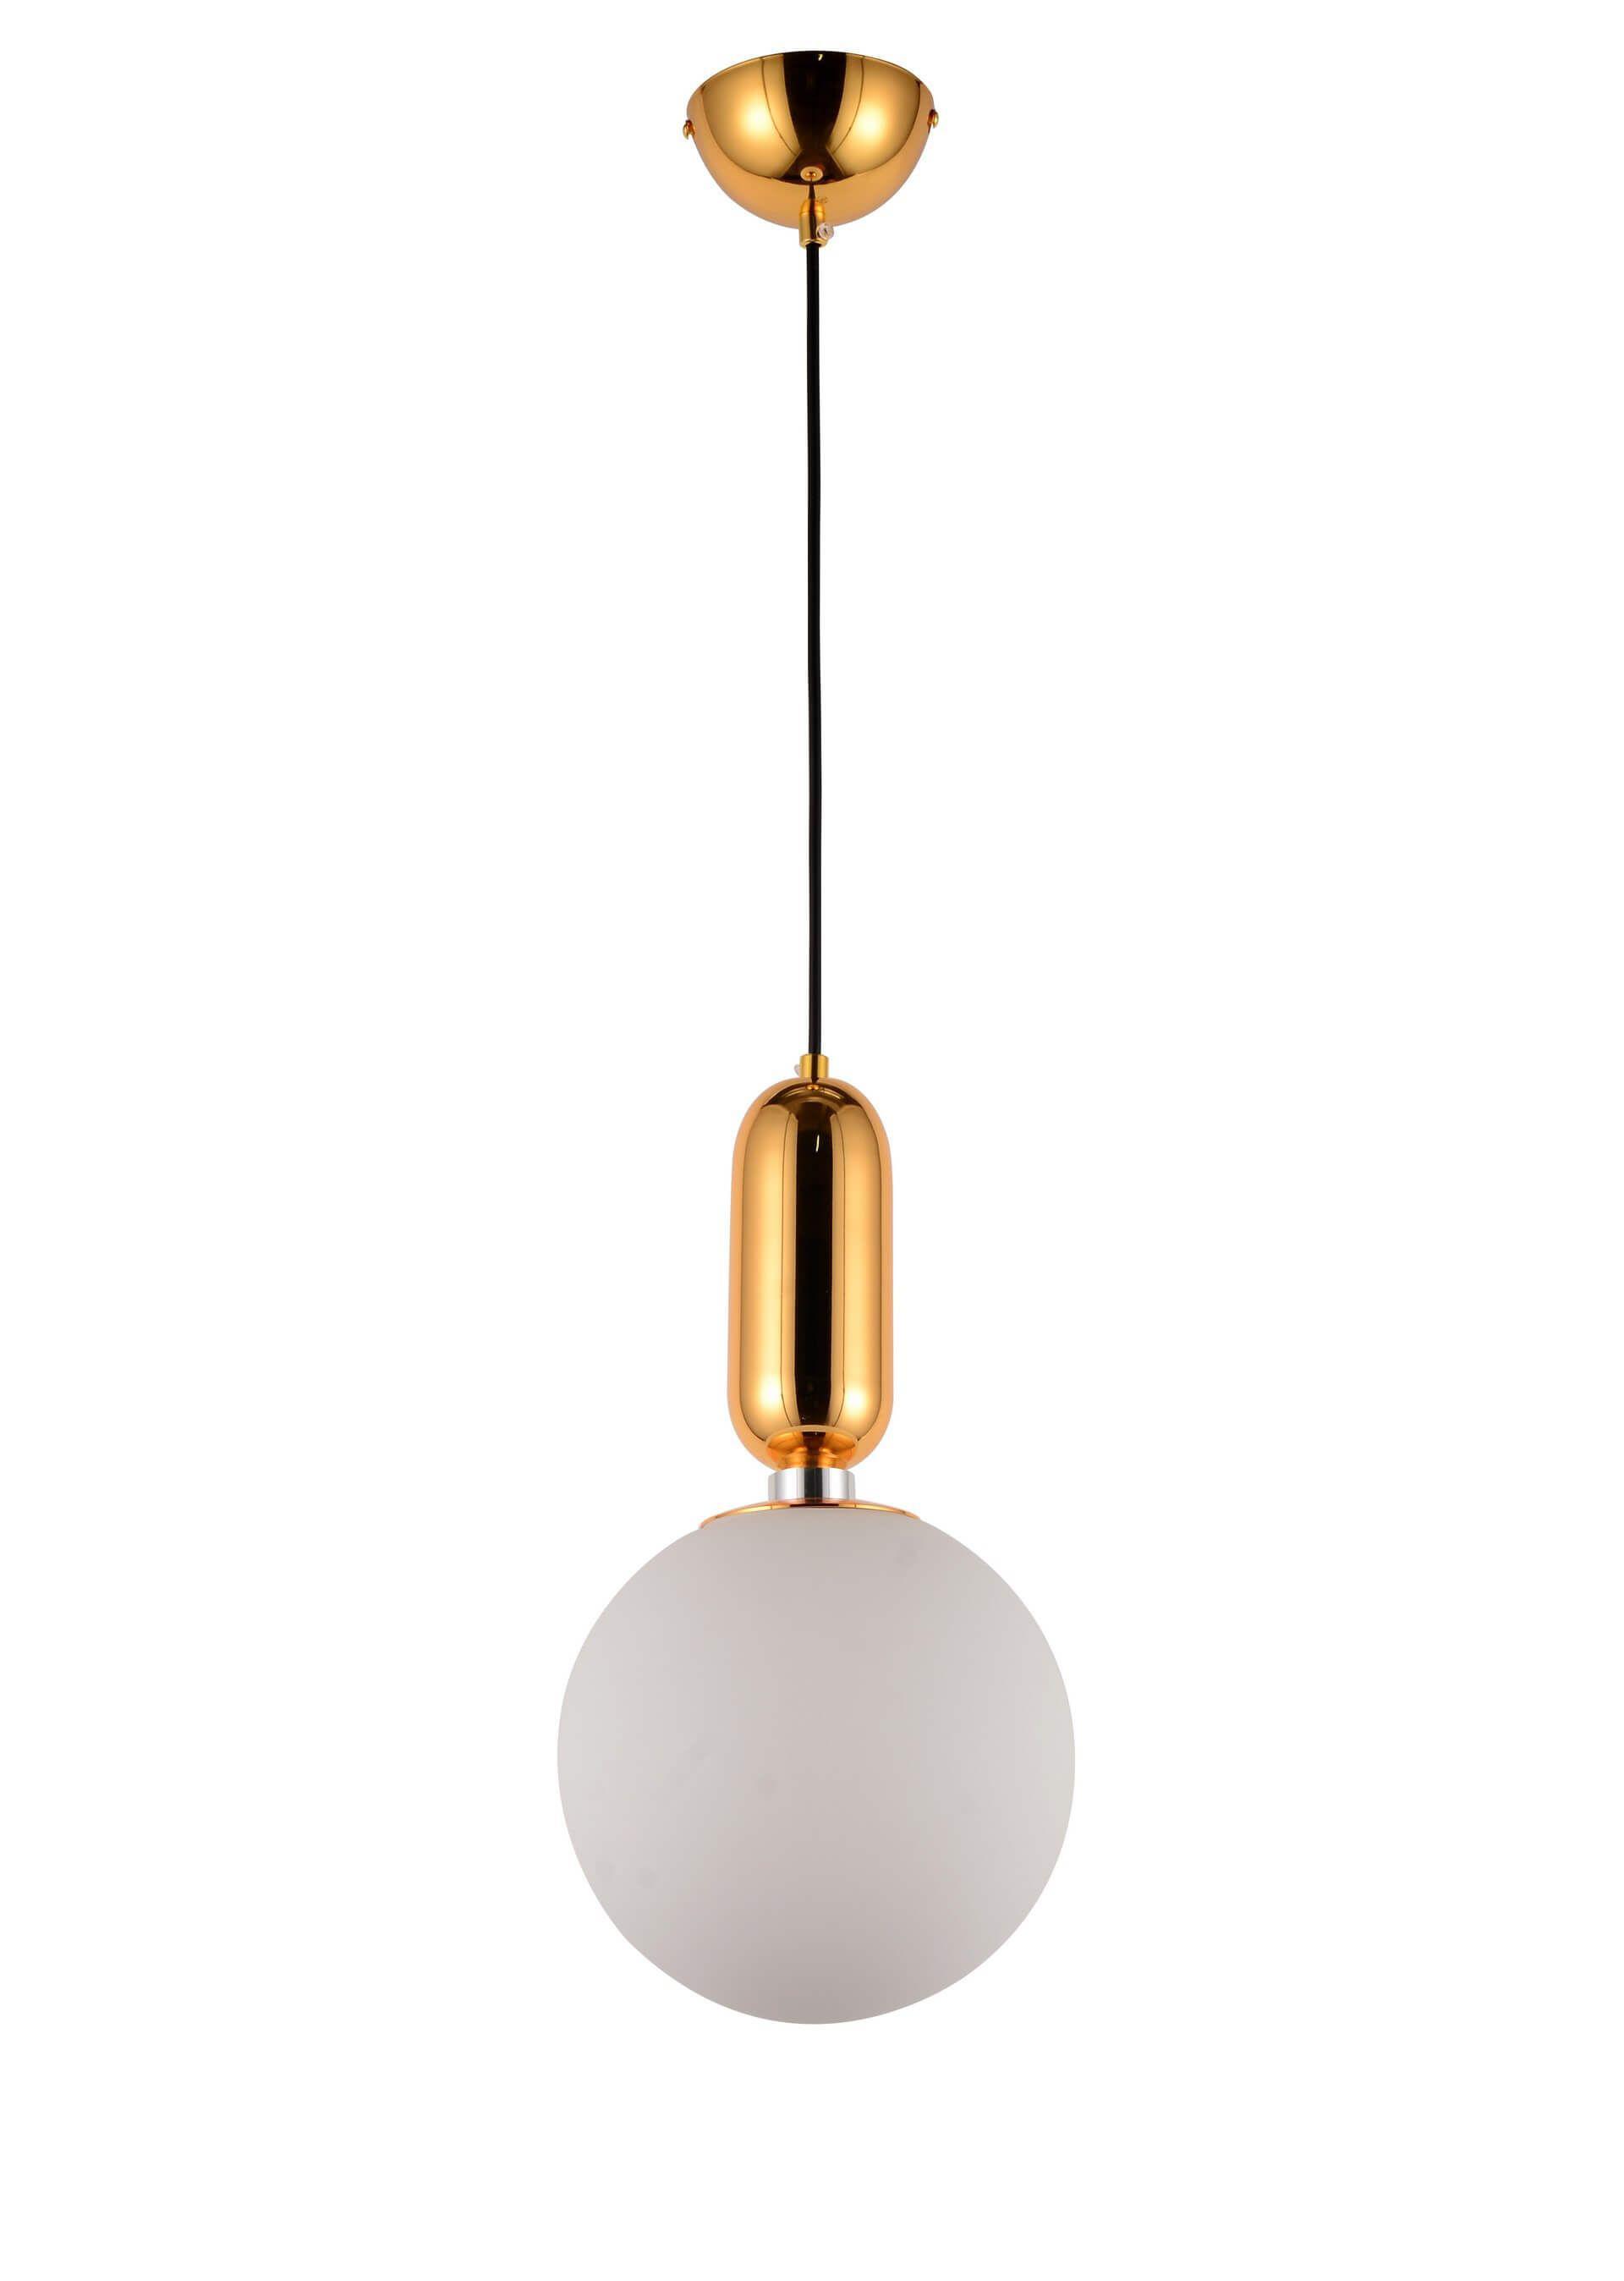 NOWOCZESNA LAMPA WISZĄCA BIAŁA ORITO GOLD D20